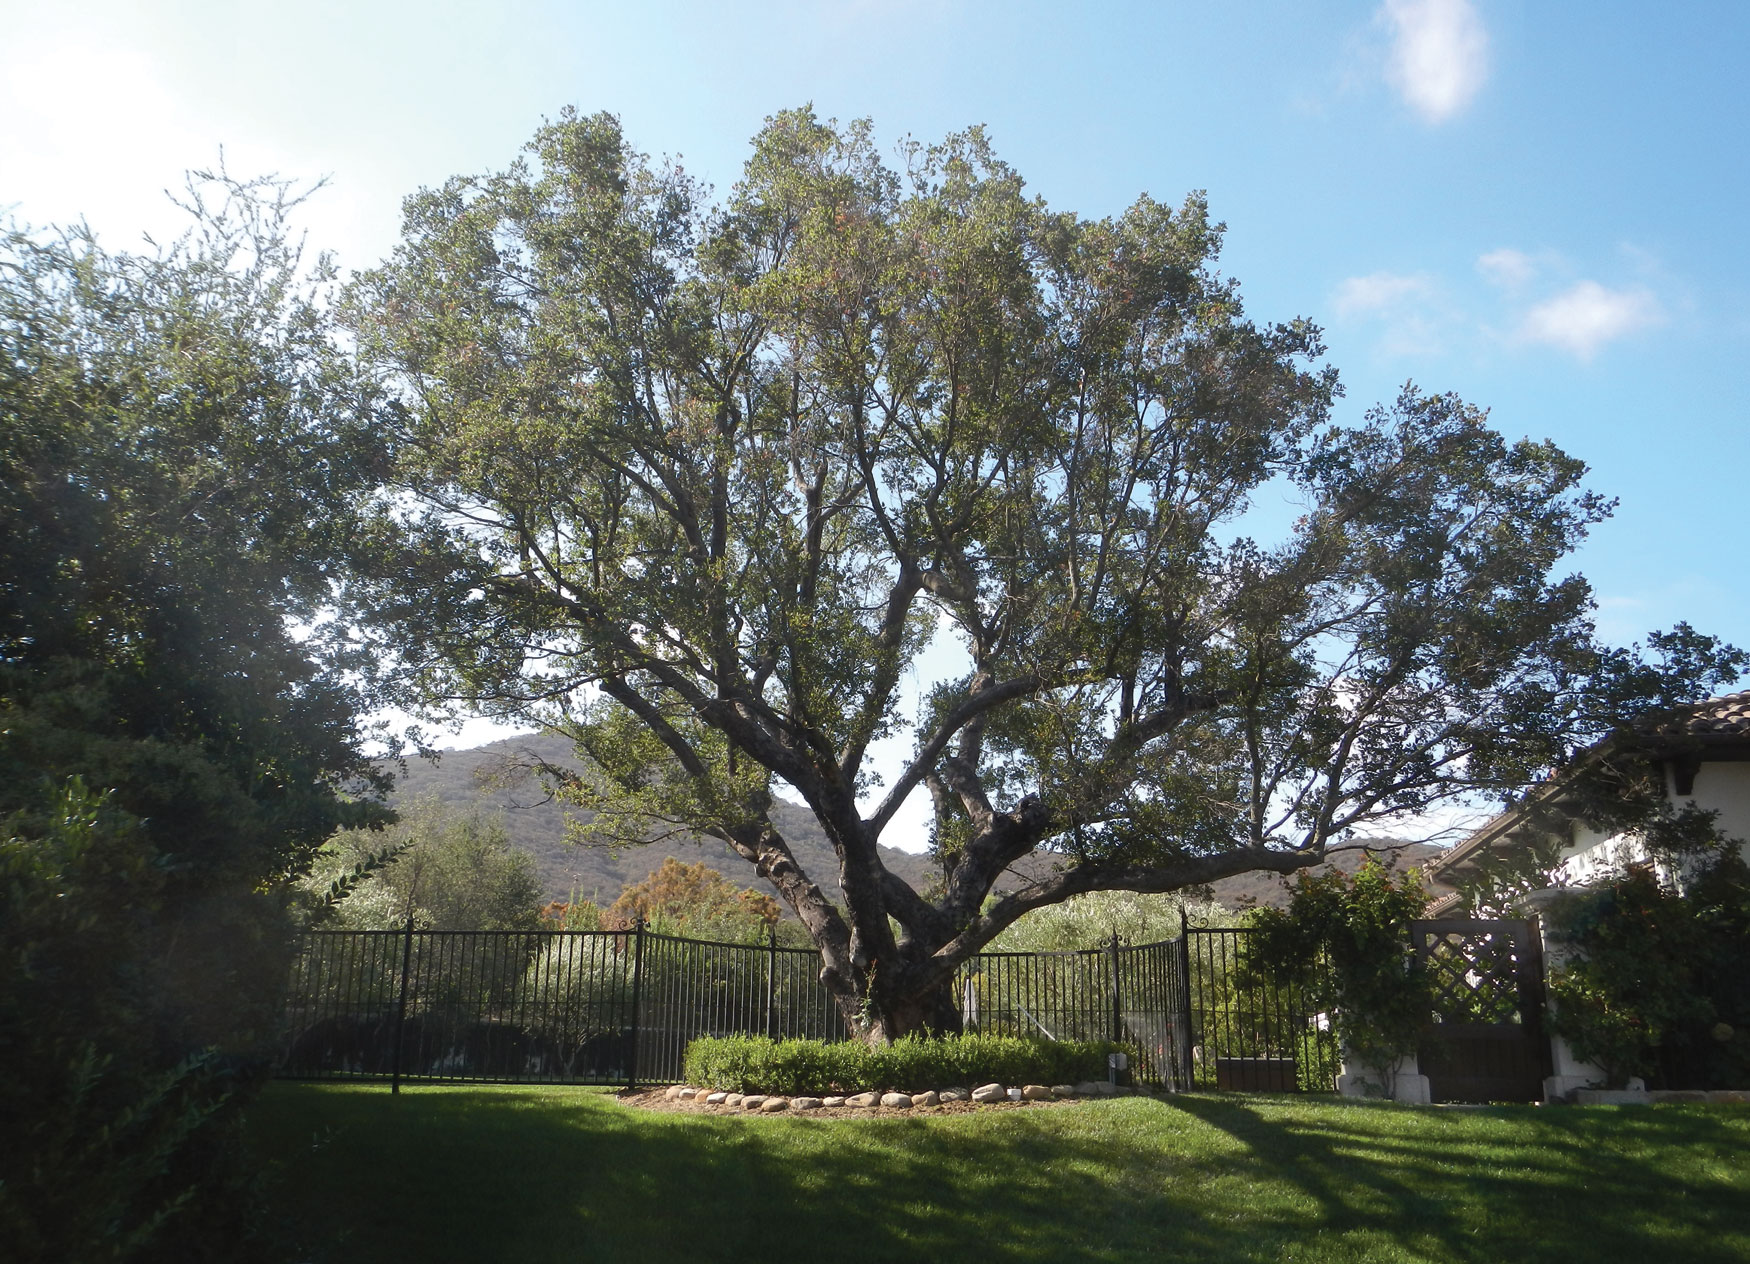 Sherwood Development Company    Oak Tree Monitoring, Preservation, & Implementation - 2005 to present